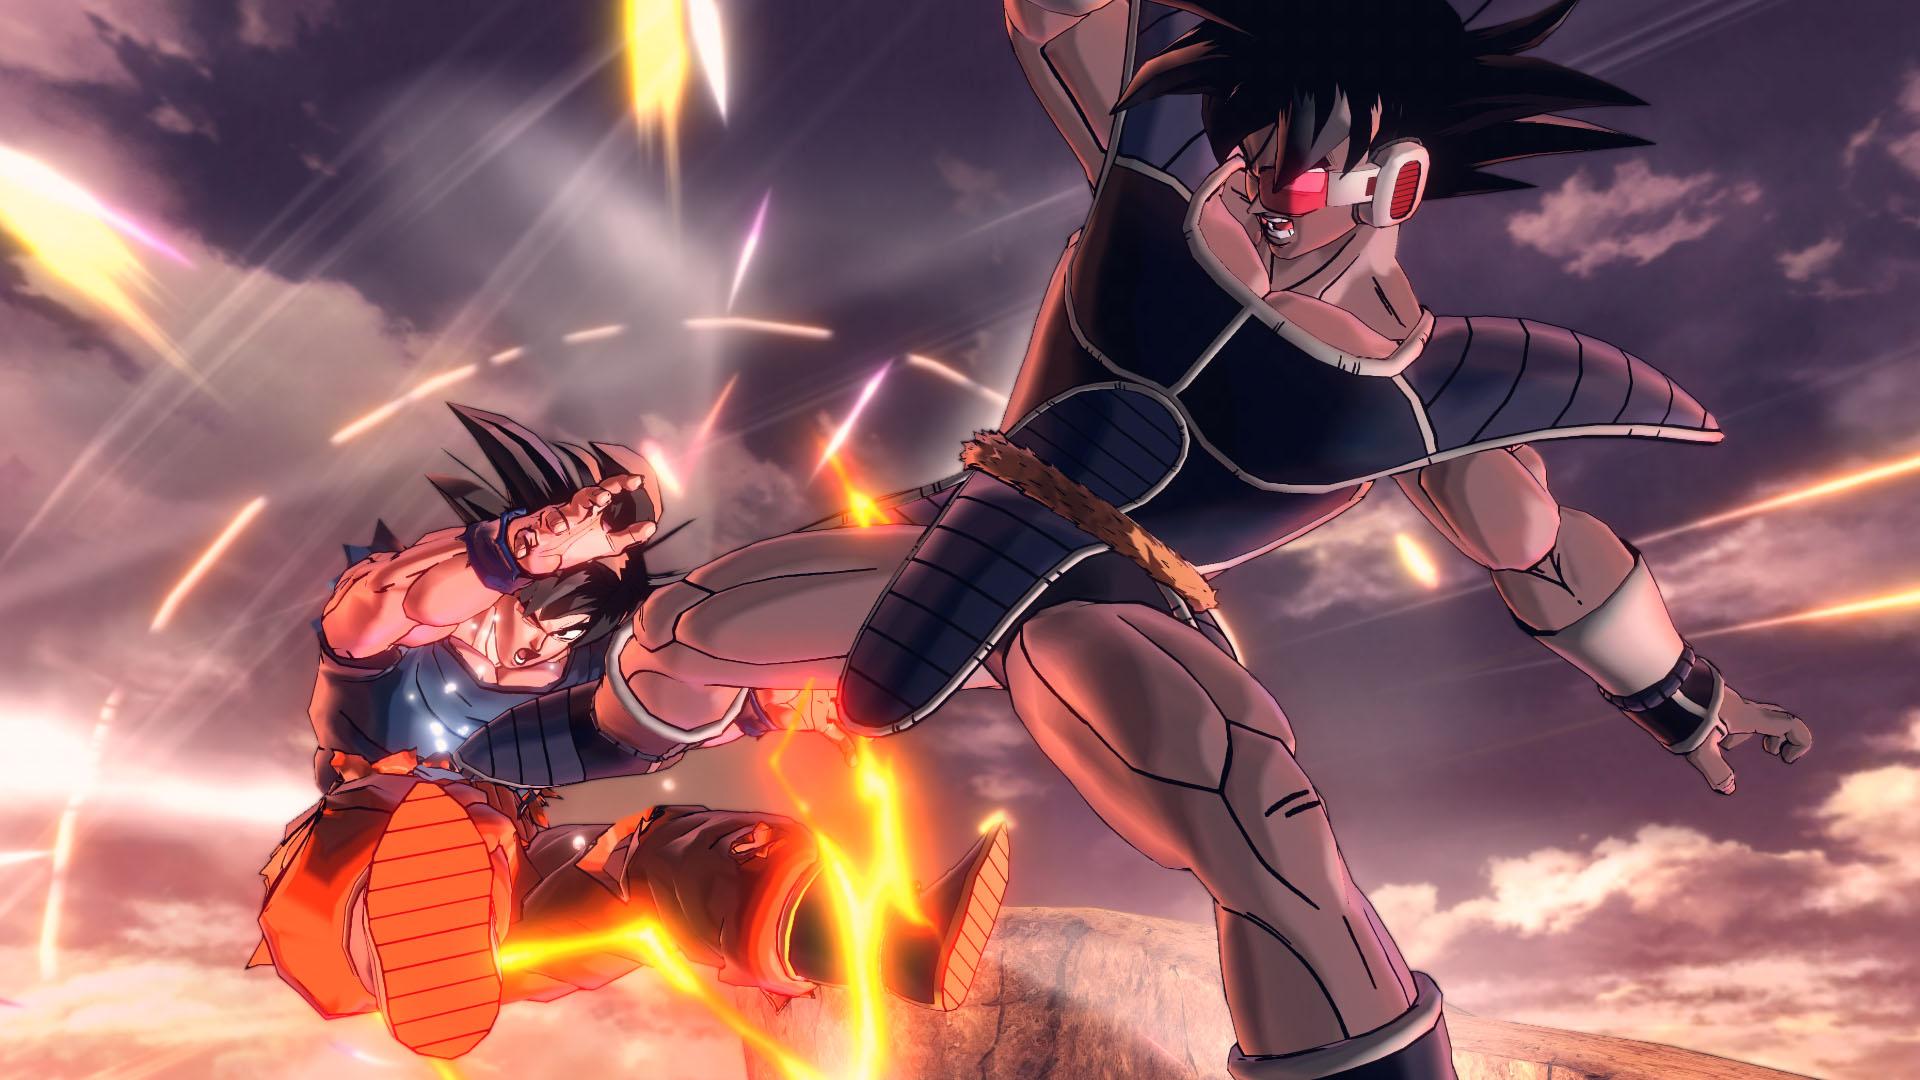 Dragon Ball Xenoverse 2 Screenshot 3